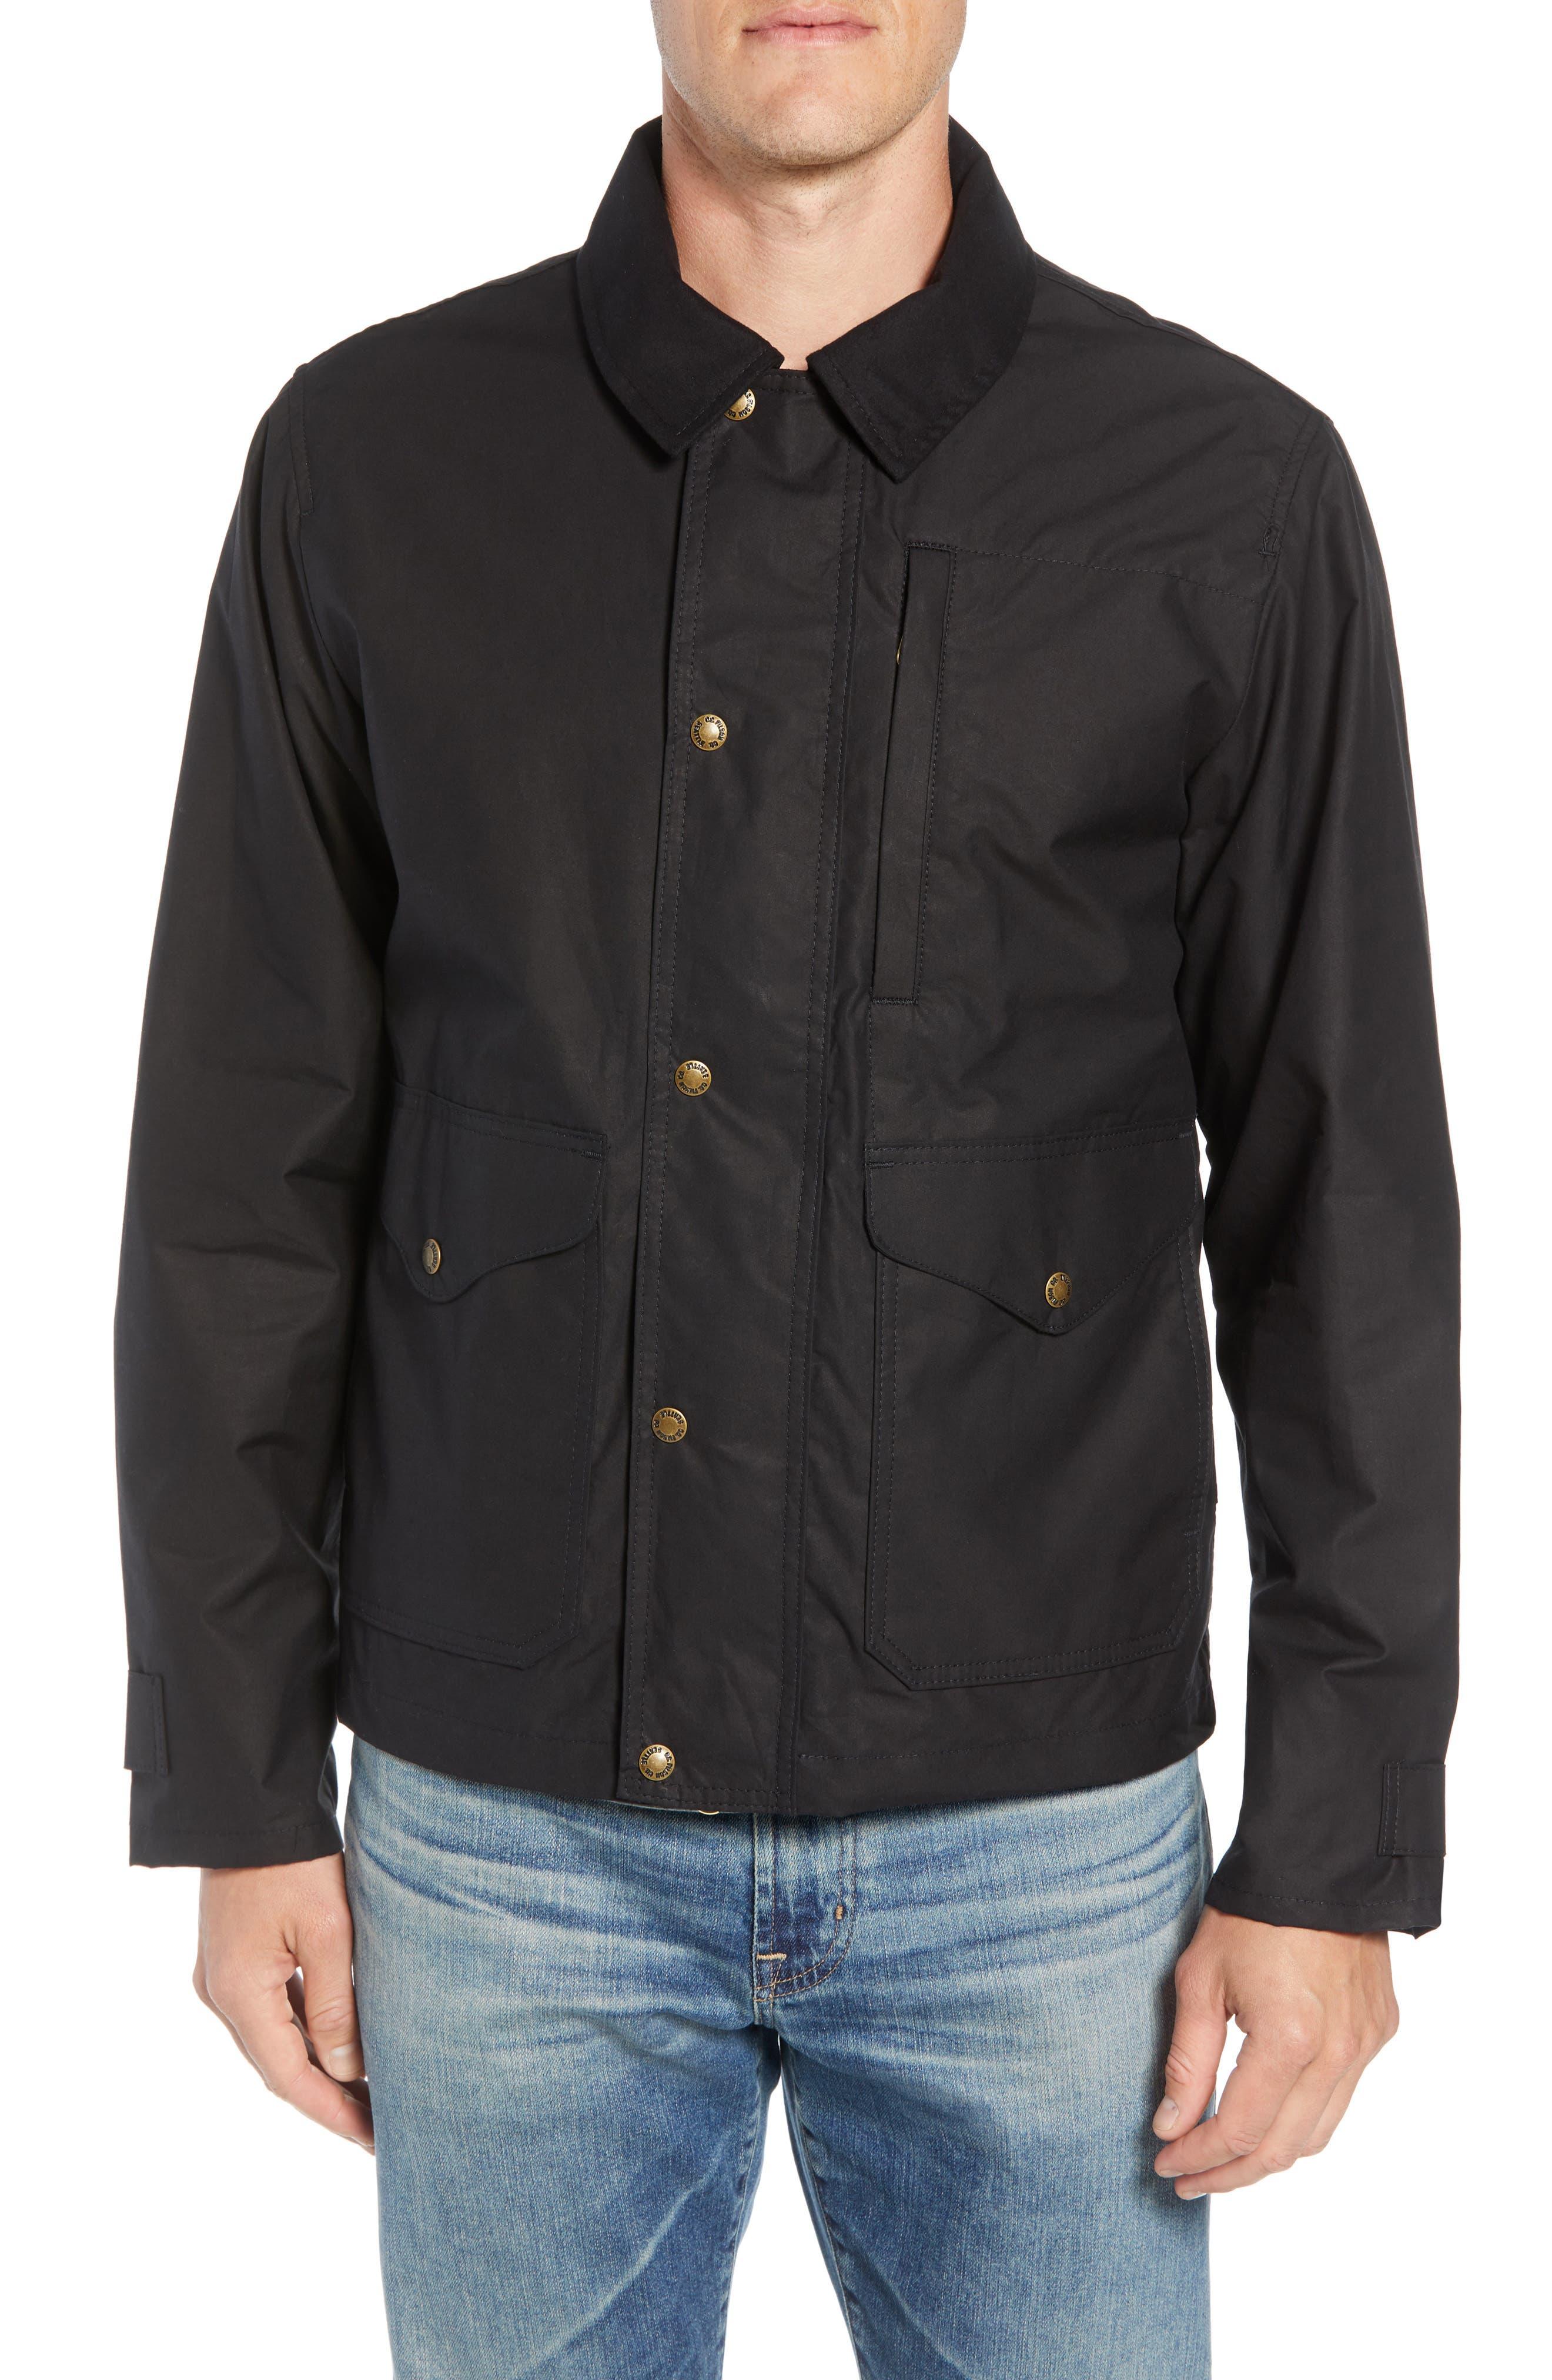 Short Mile Marker Waxed Cotton Jacket,                             Alternate thumbnail 4, color,                             BLACK